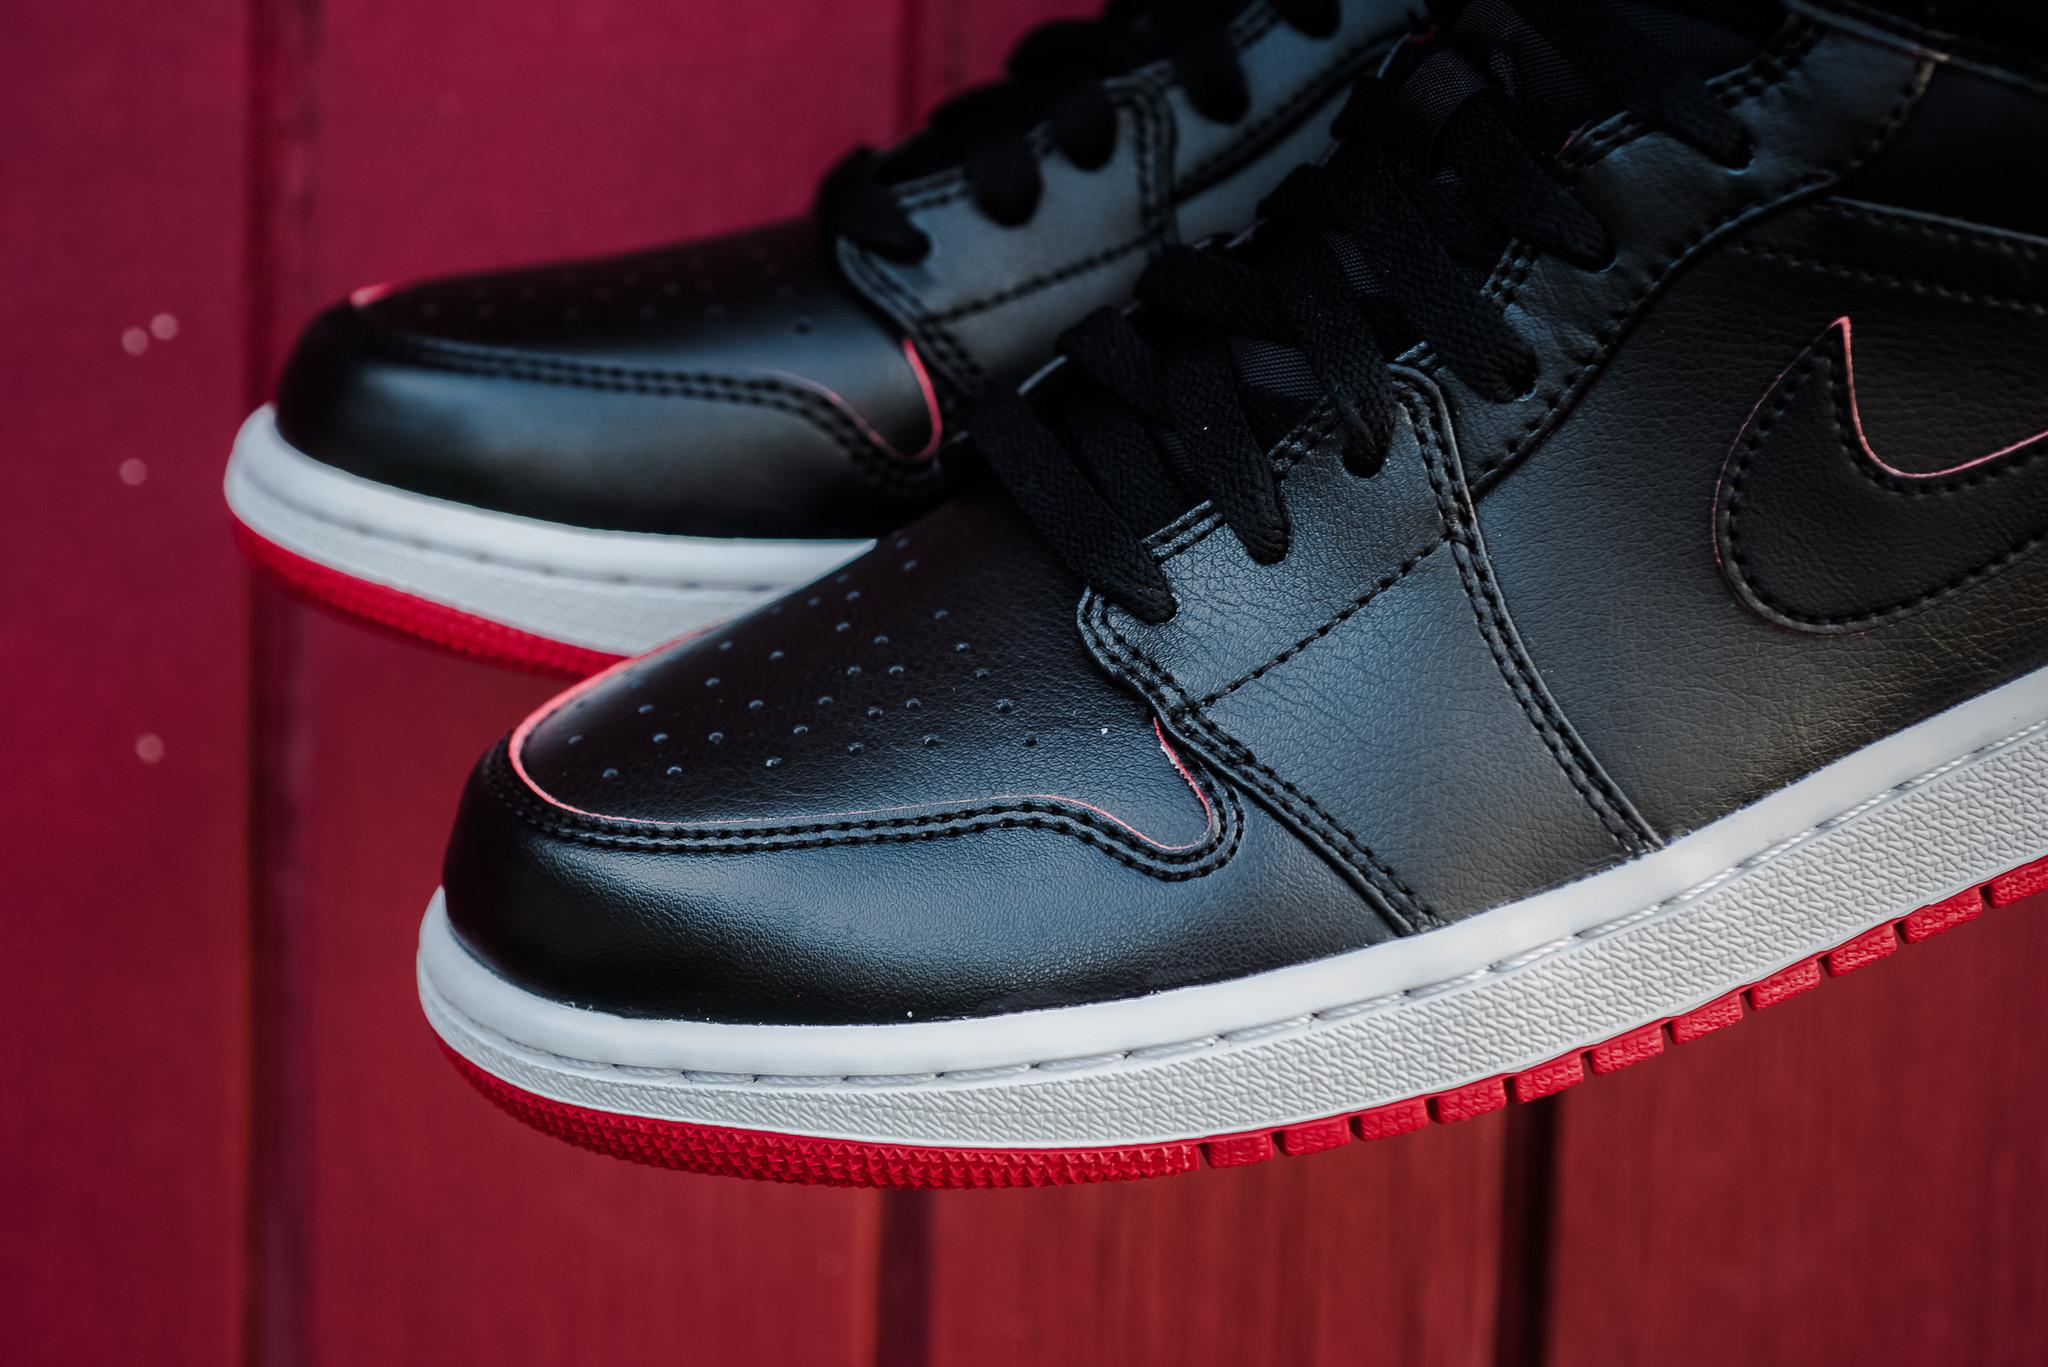 air jordan 1 mid black gym red sneakers addict. Black Bedroom Furniture Sets. Home Design Ideas